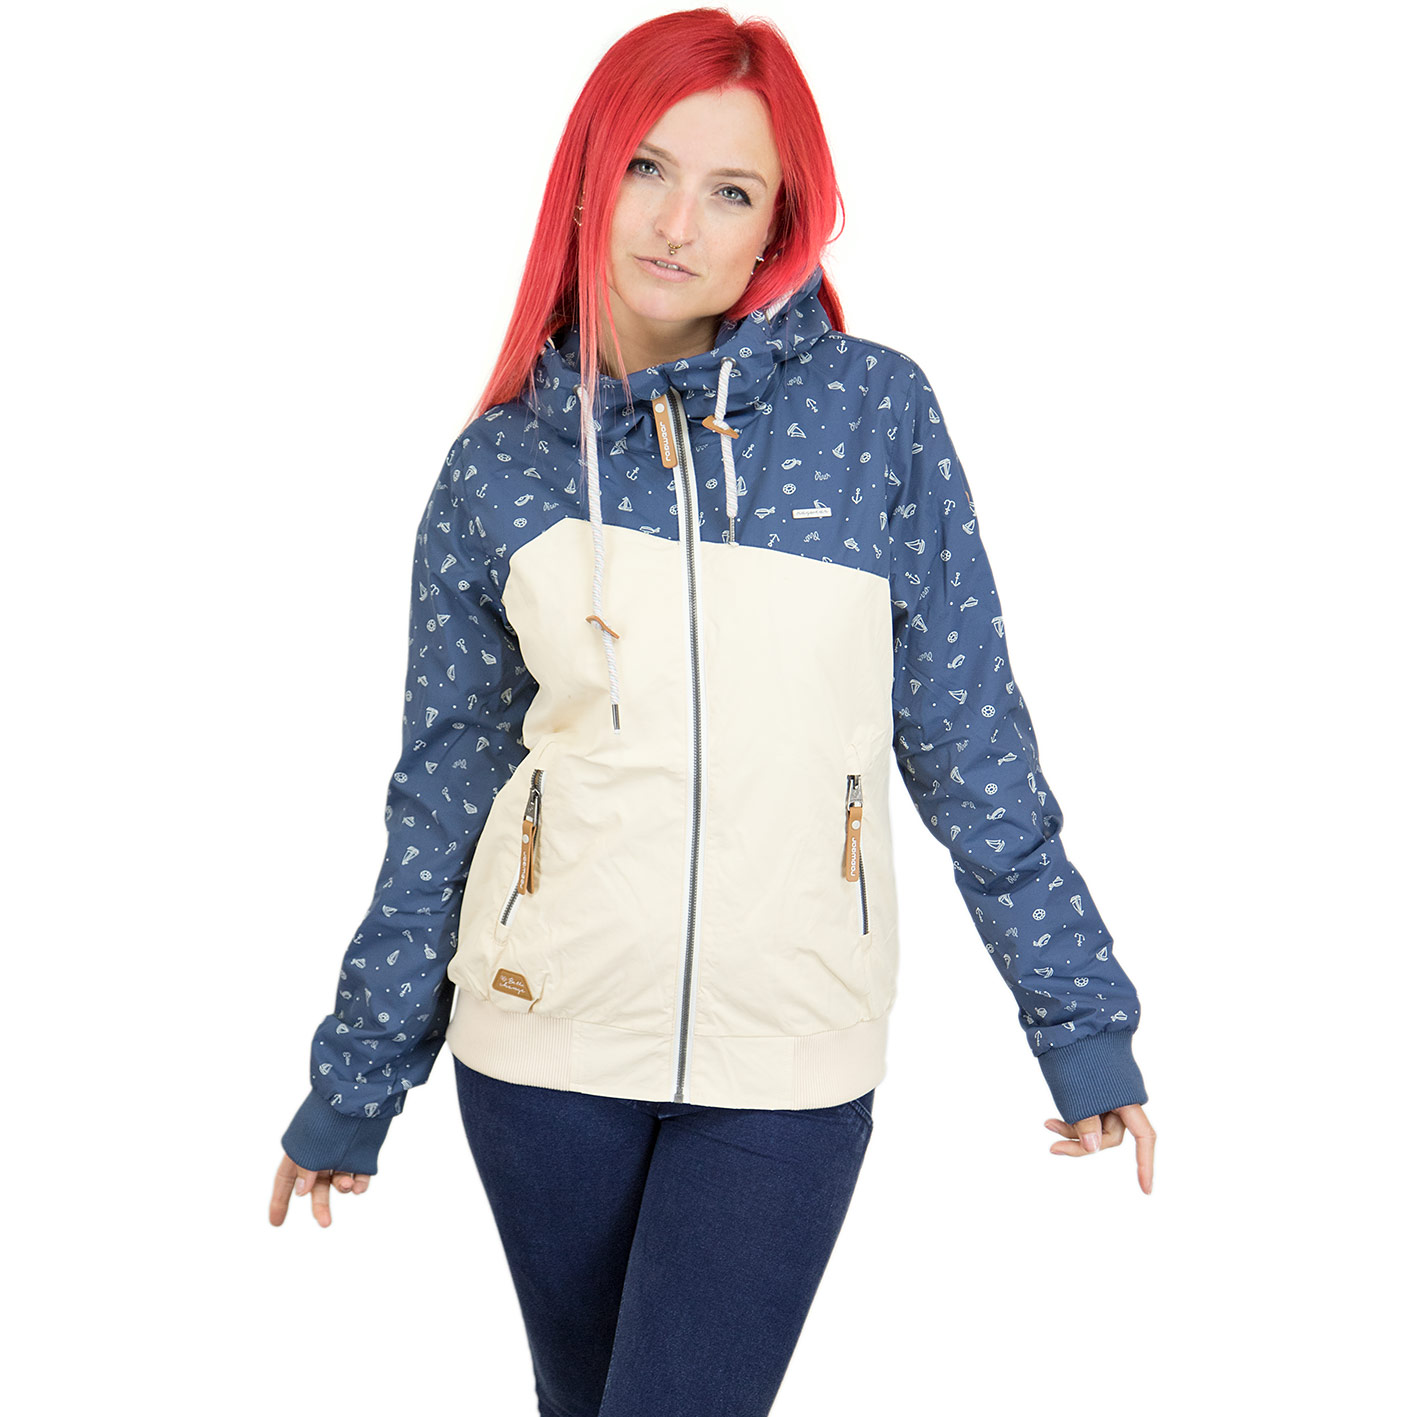 cheap for discount 21779 43614 Ragwear Damen-Jacke Nuggie B denim blau